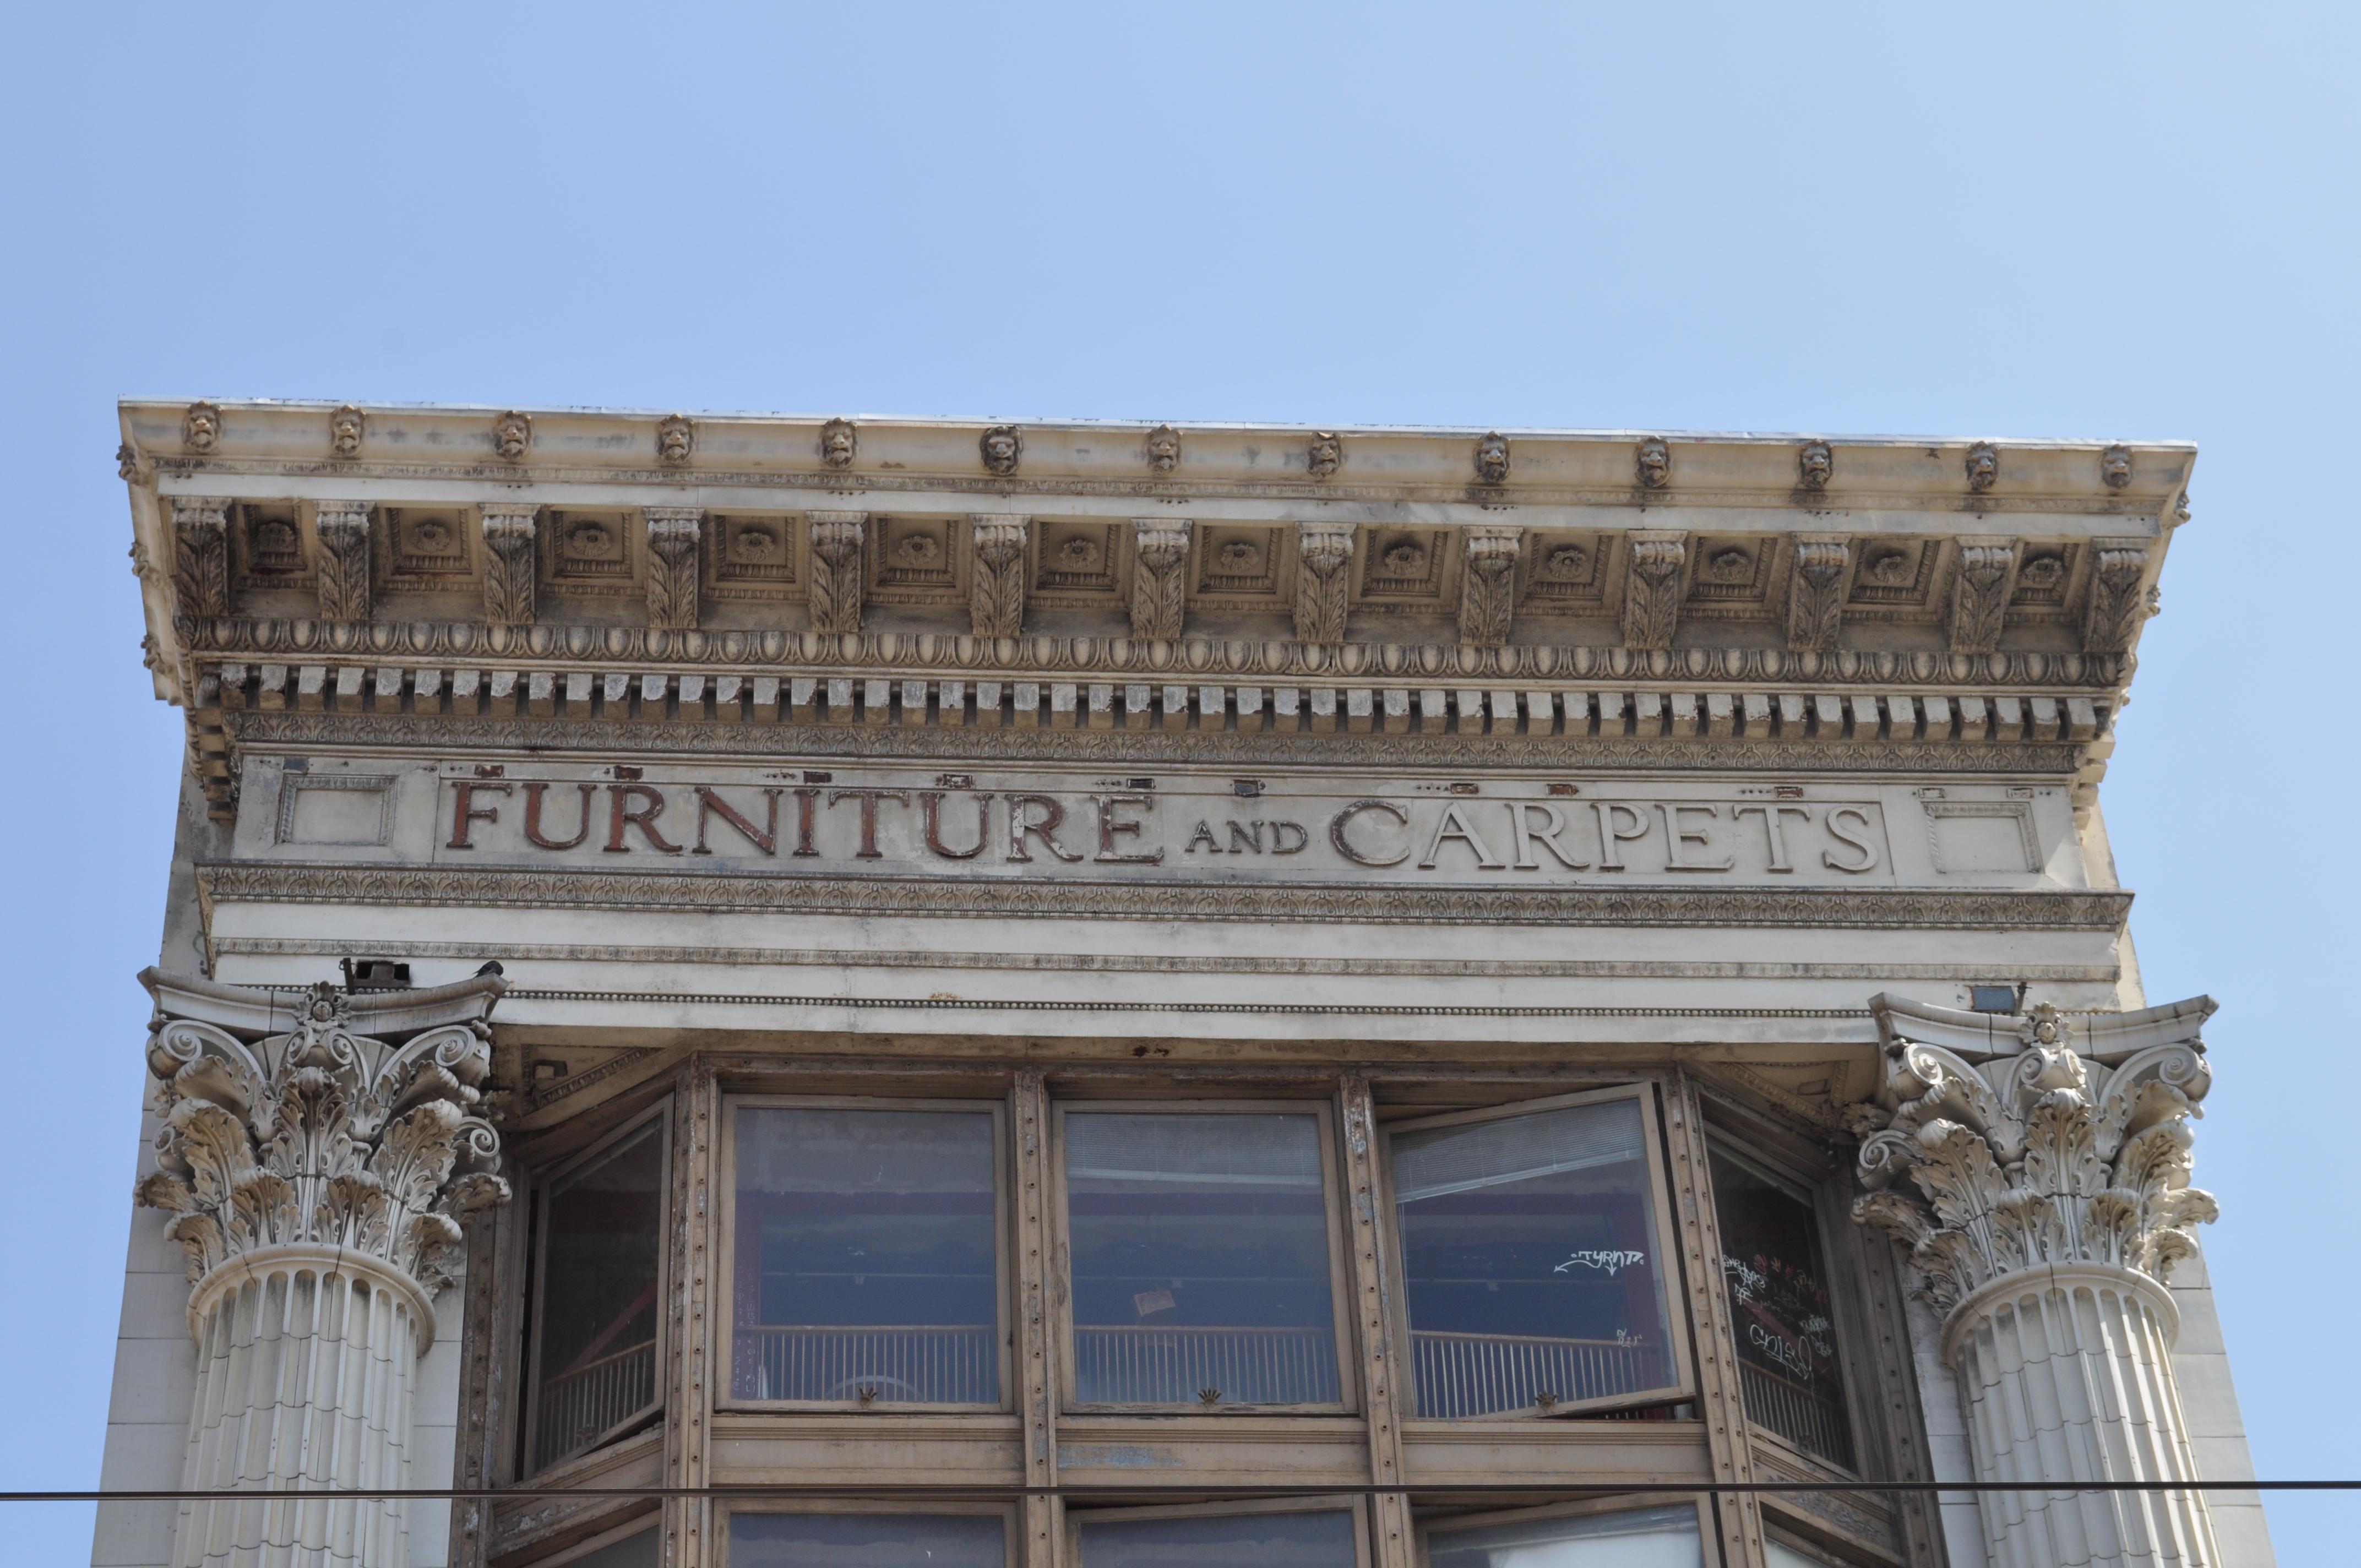 File San Francisco Furniture and Carpets cornice